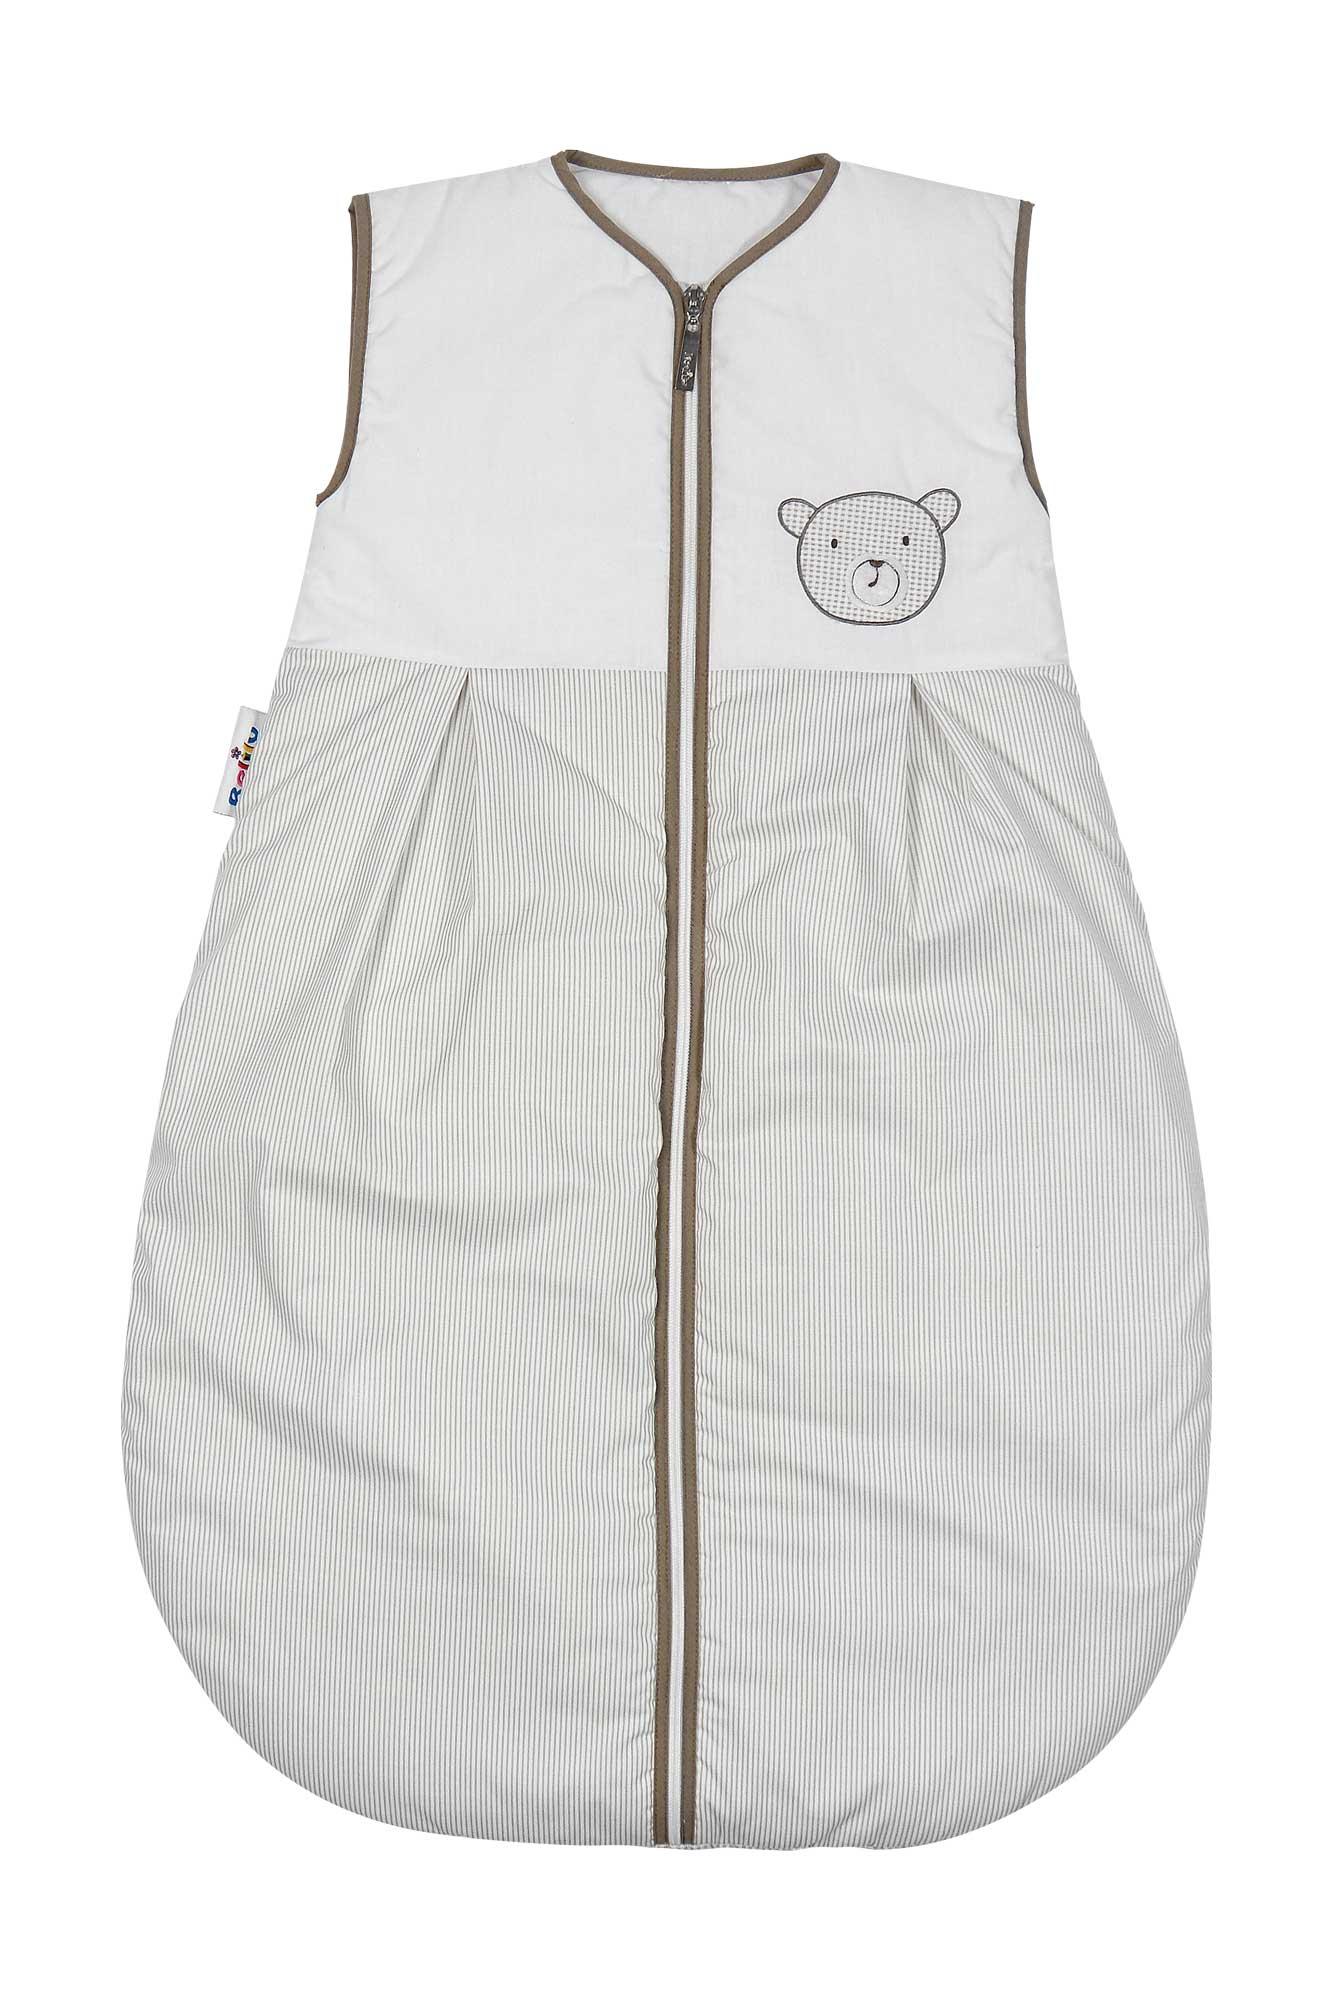 Teddy Bear Teds Baby S Sleeping Bag Nest Bag Label For